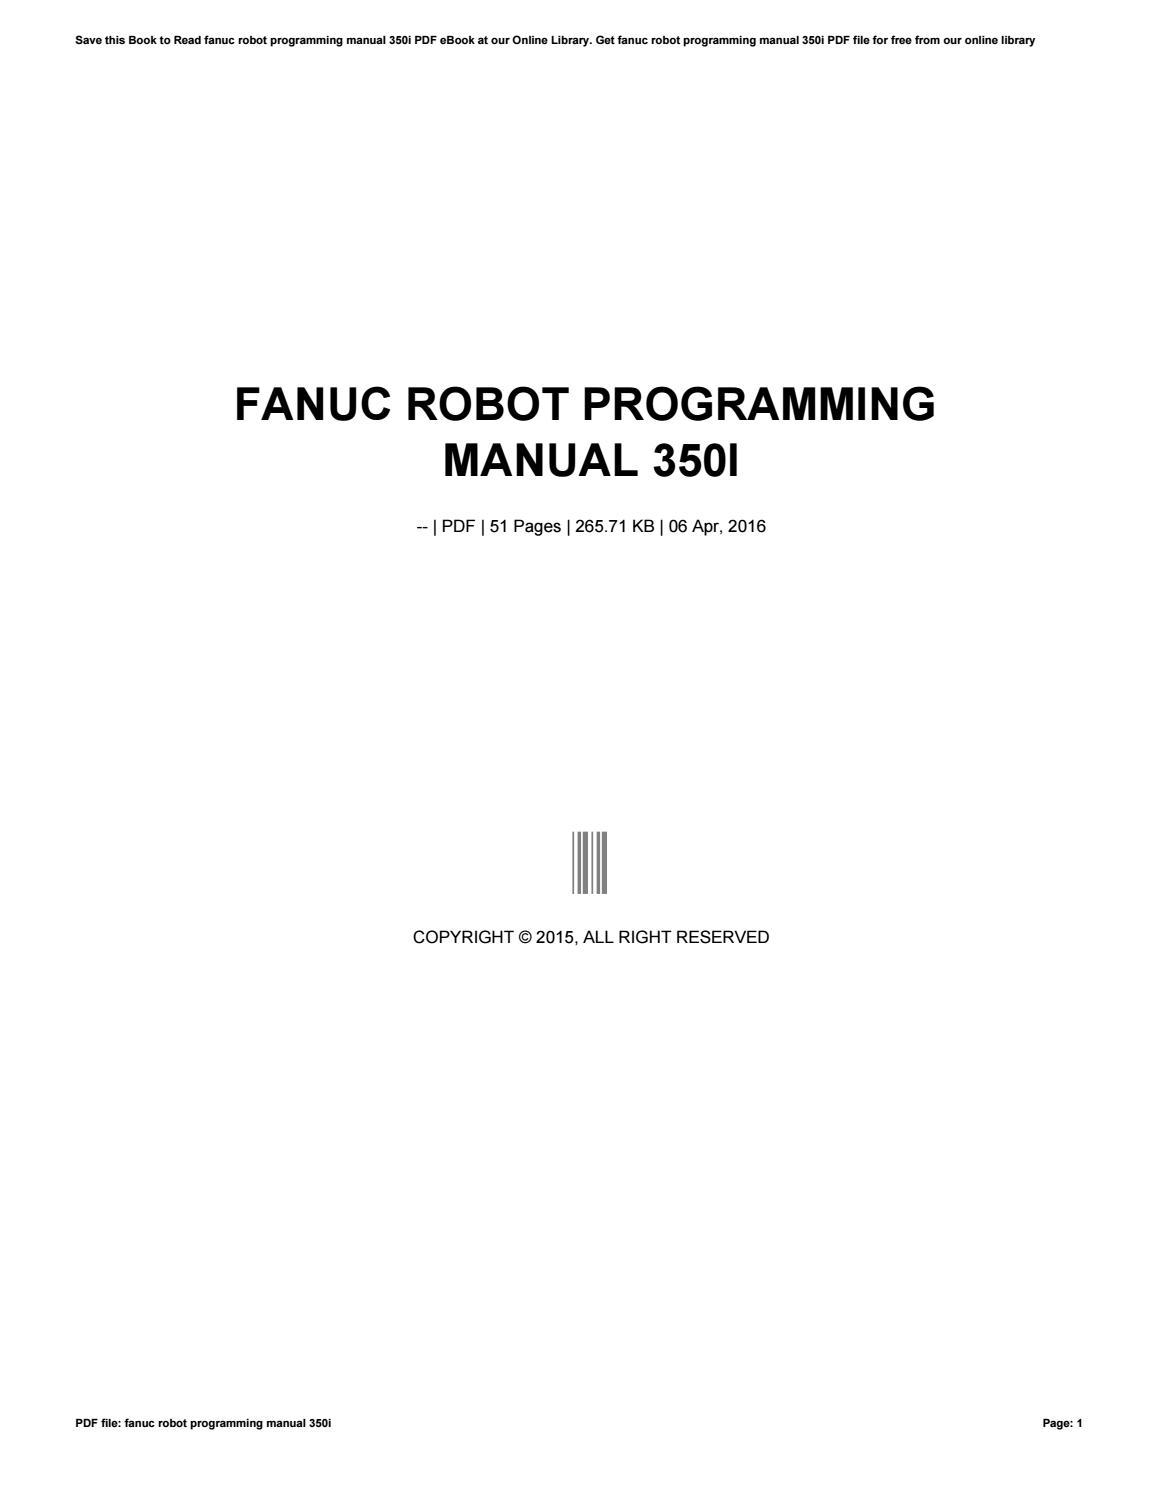 Fanuc Robot Programming manual